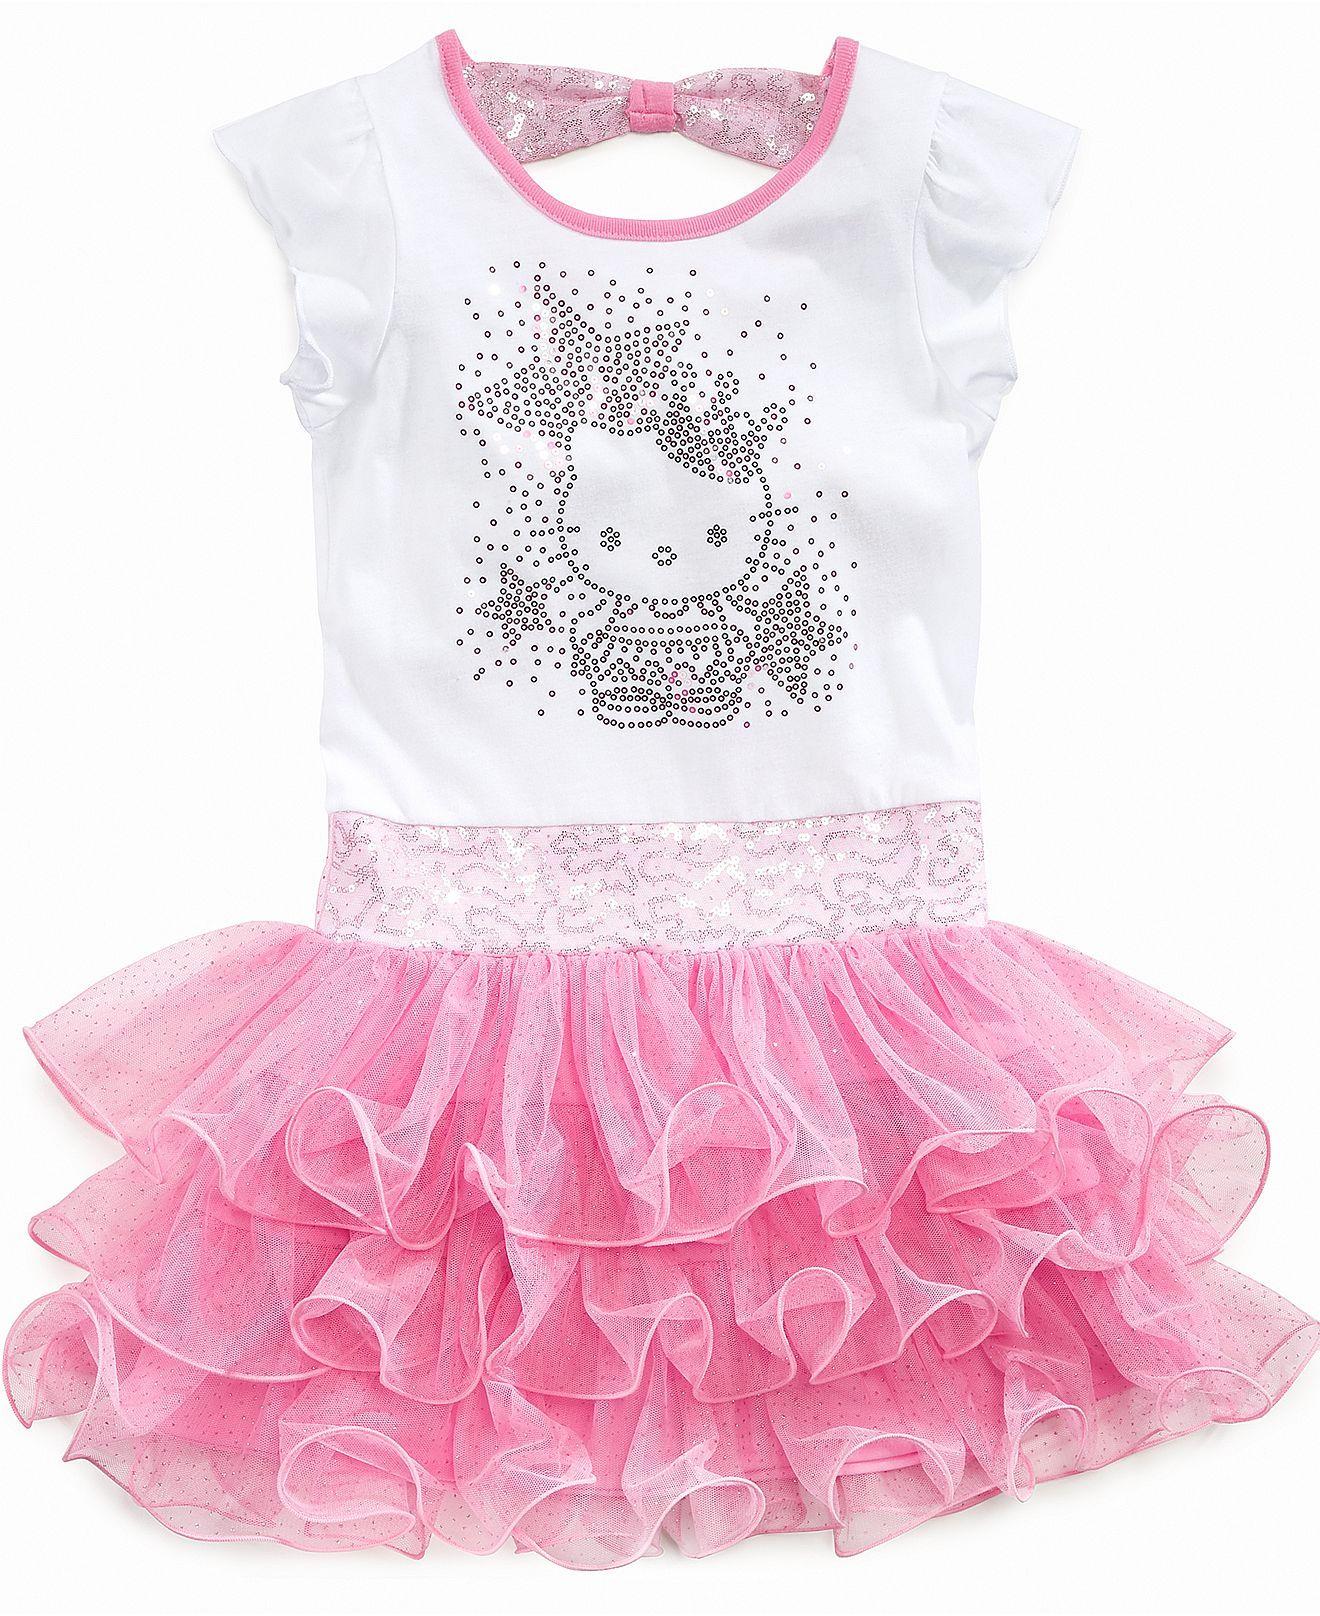 Hello Kitty Girls Dress Little Girls Princess Tutu Dress